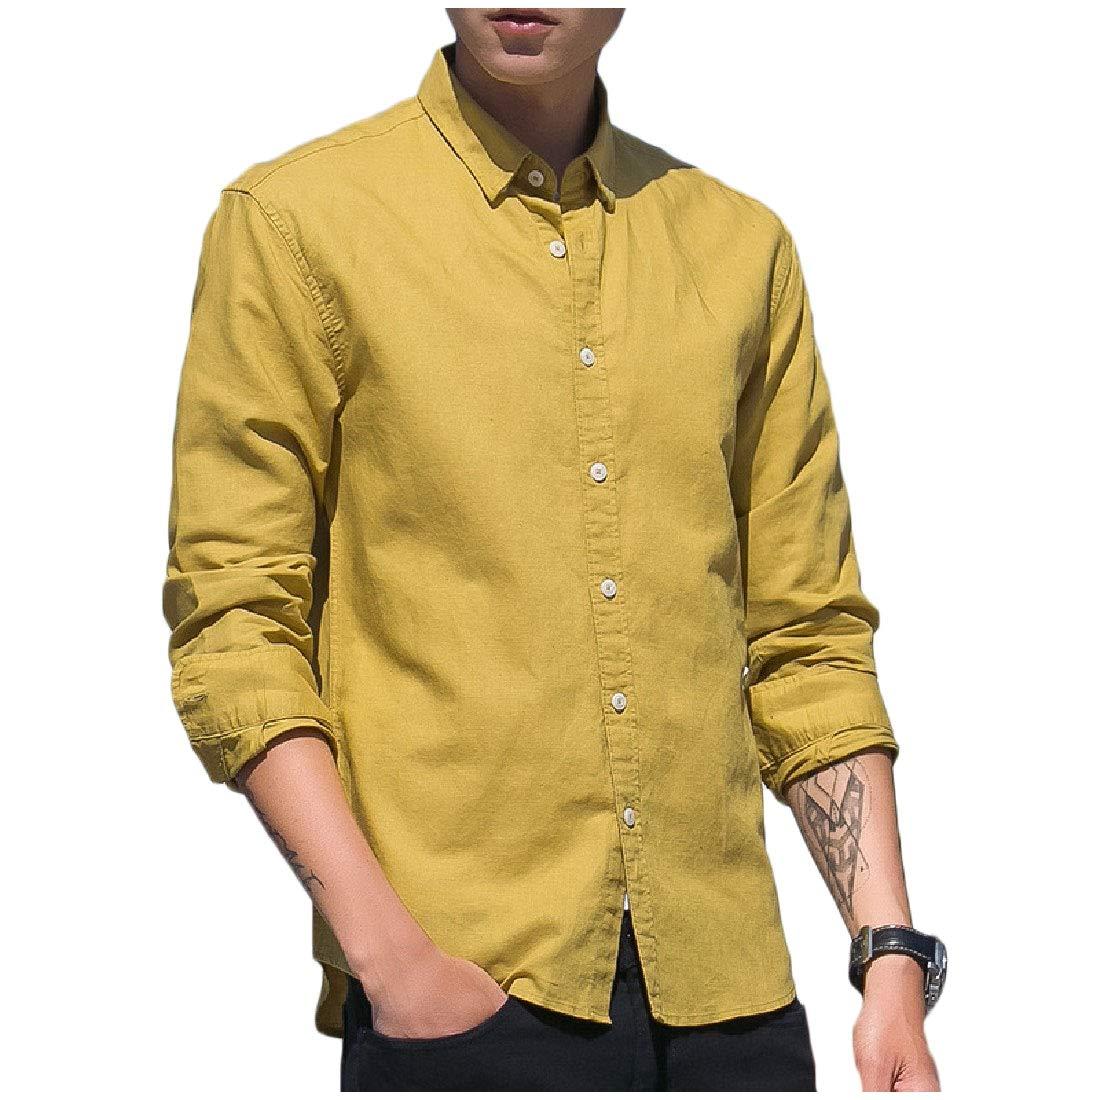 MirrliyMen Slim Long Sleeve Solid Colored Turn-Down Collar Flax Shirt